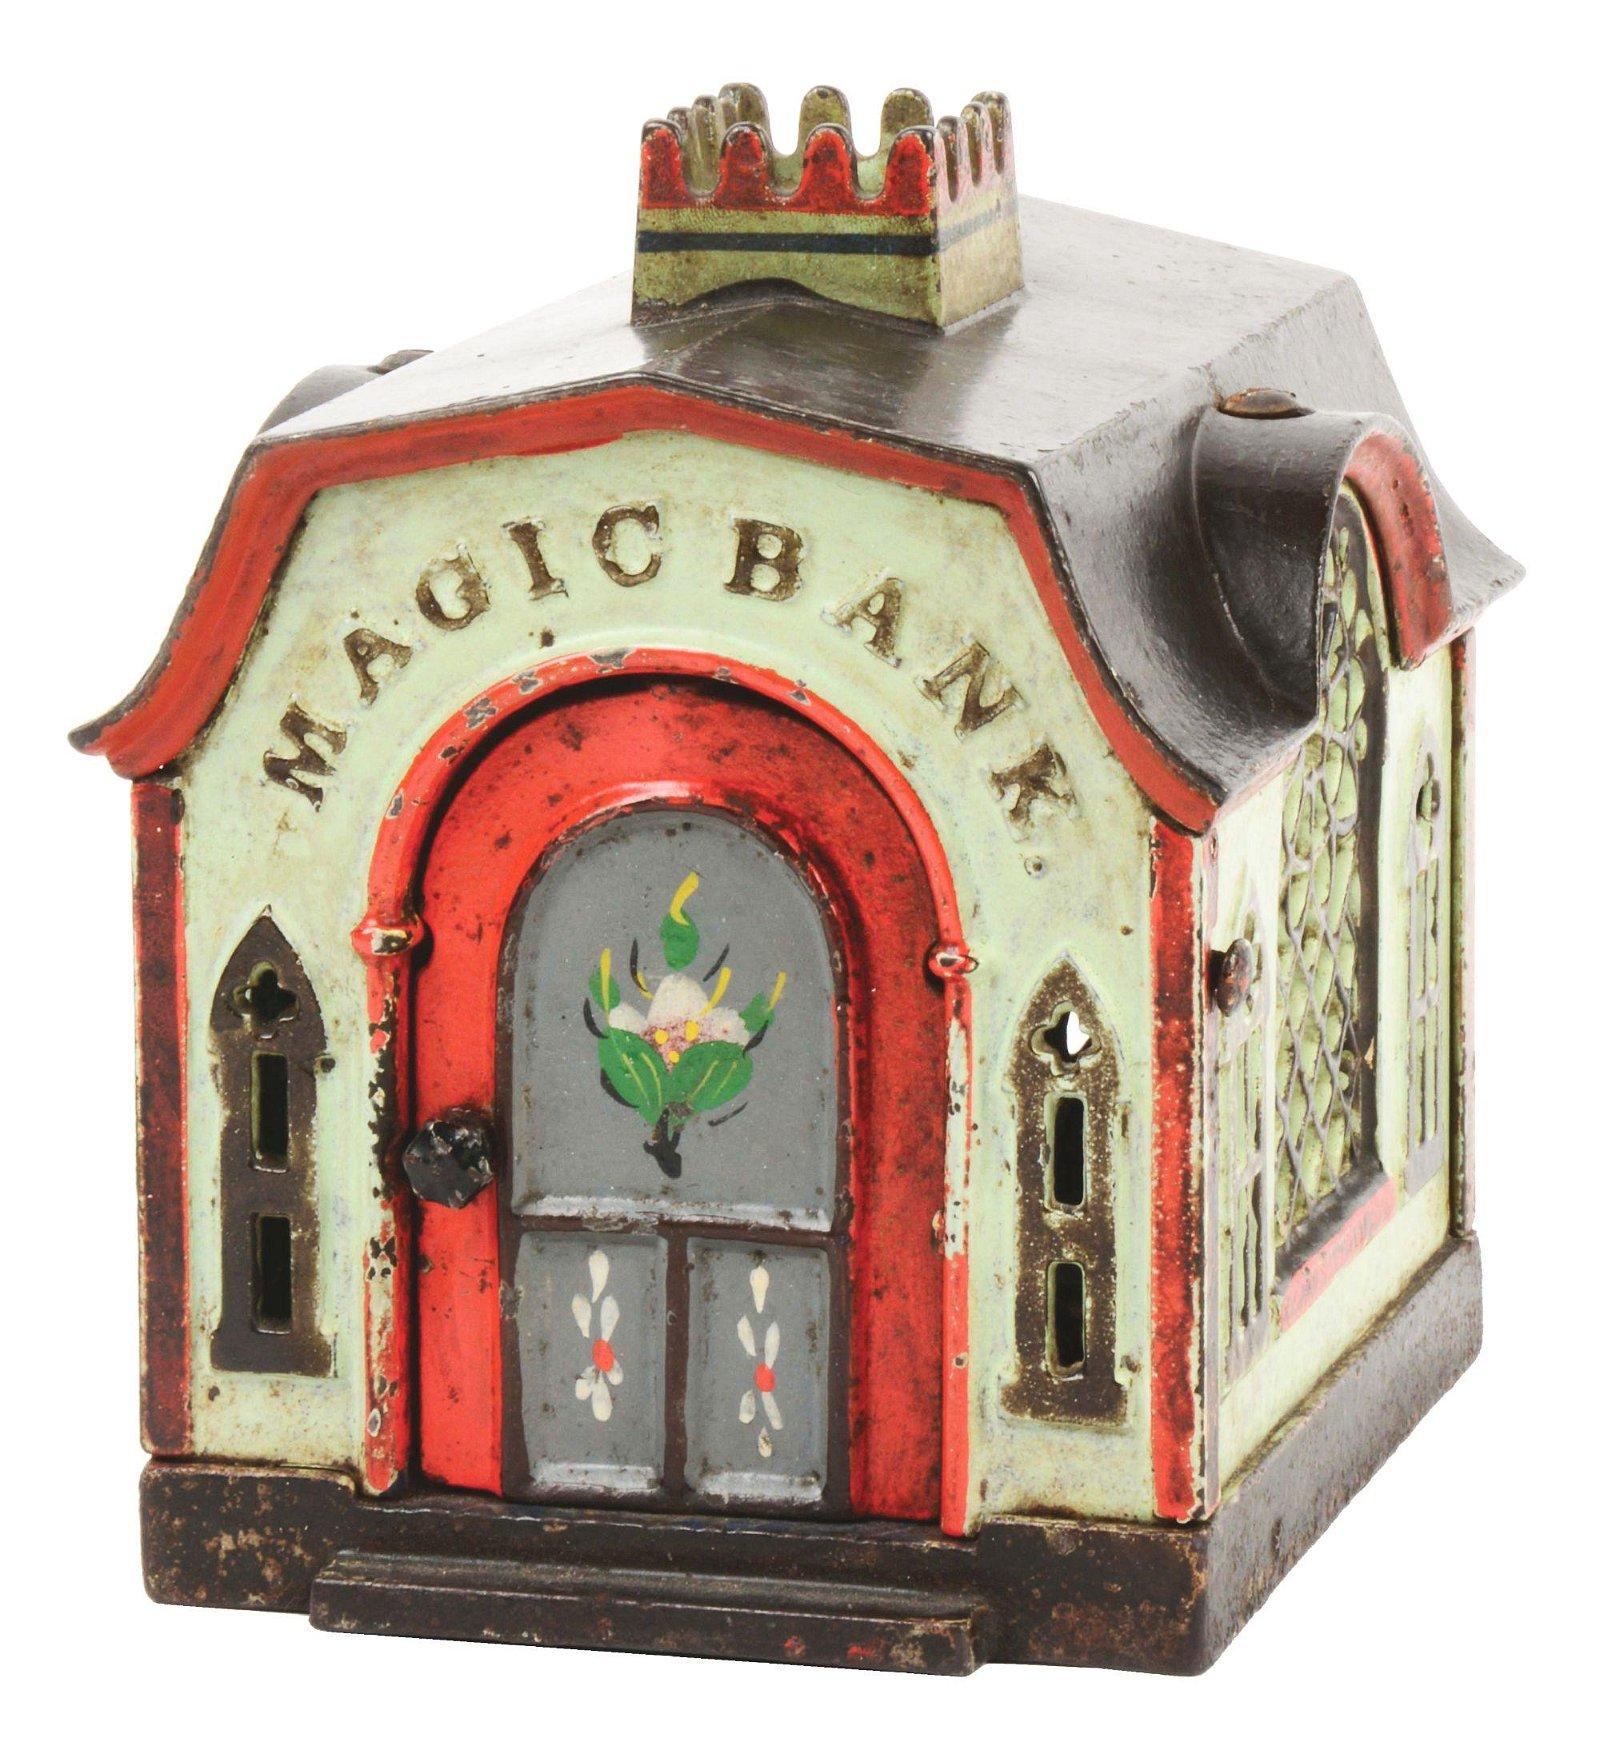 J & E STEVENS MAGIC CAST IRON MECHANICAL BANK.